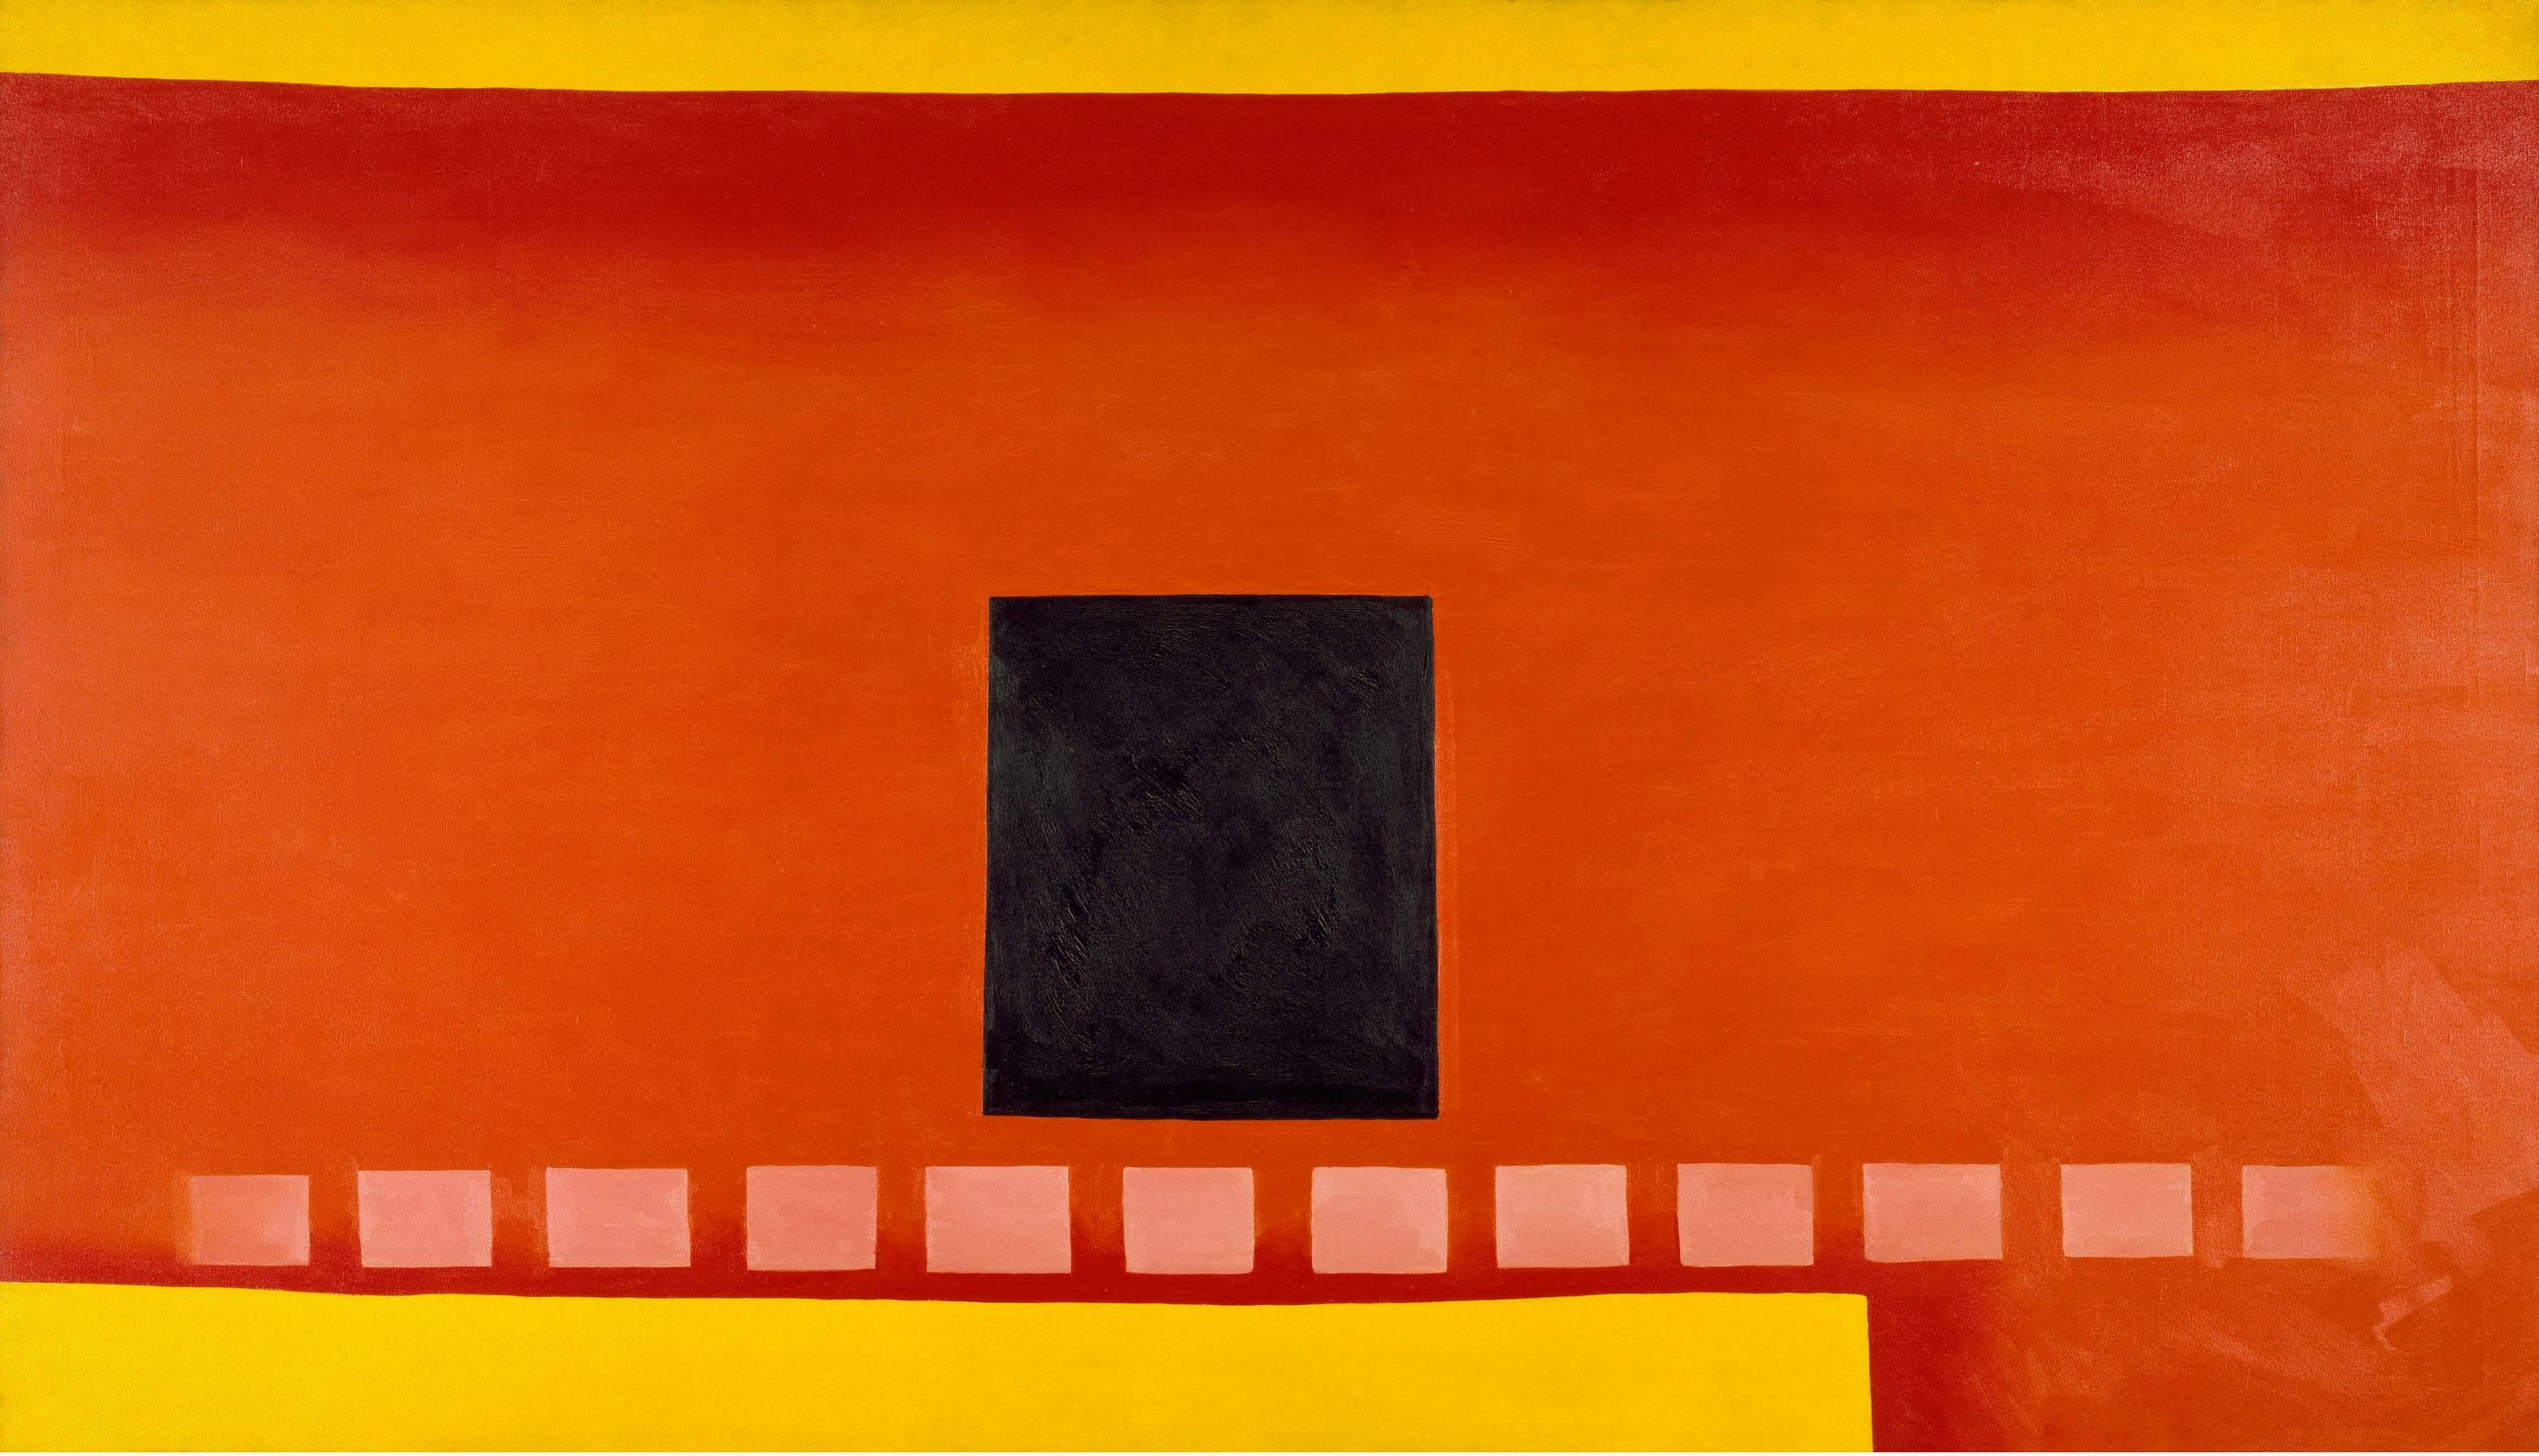 Georgia O'Keeffe Black Door with Red, 1954 Huile sur toile, 121,9 × 213,4 cm Chrysler Museum of Art, Norfolk, Virginie. Bequest of Walter P. Chrysler, Jr.  Image Chrysler Museum of Art, Norfolk, VA  © Georgia O'Keeffe Museum / Adagp, Paris, 2021